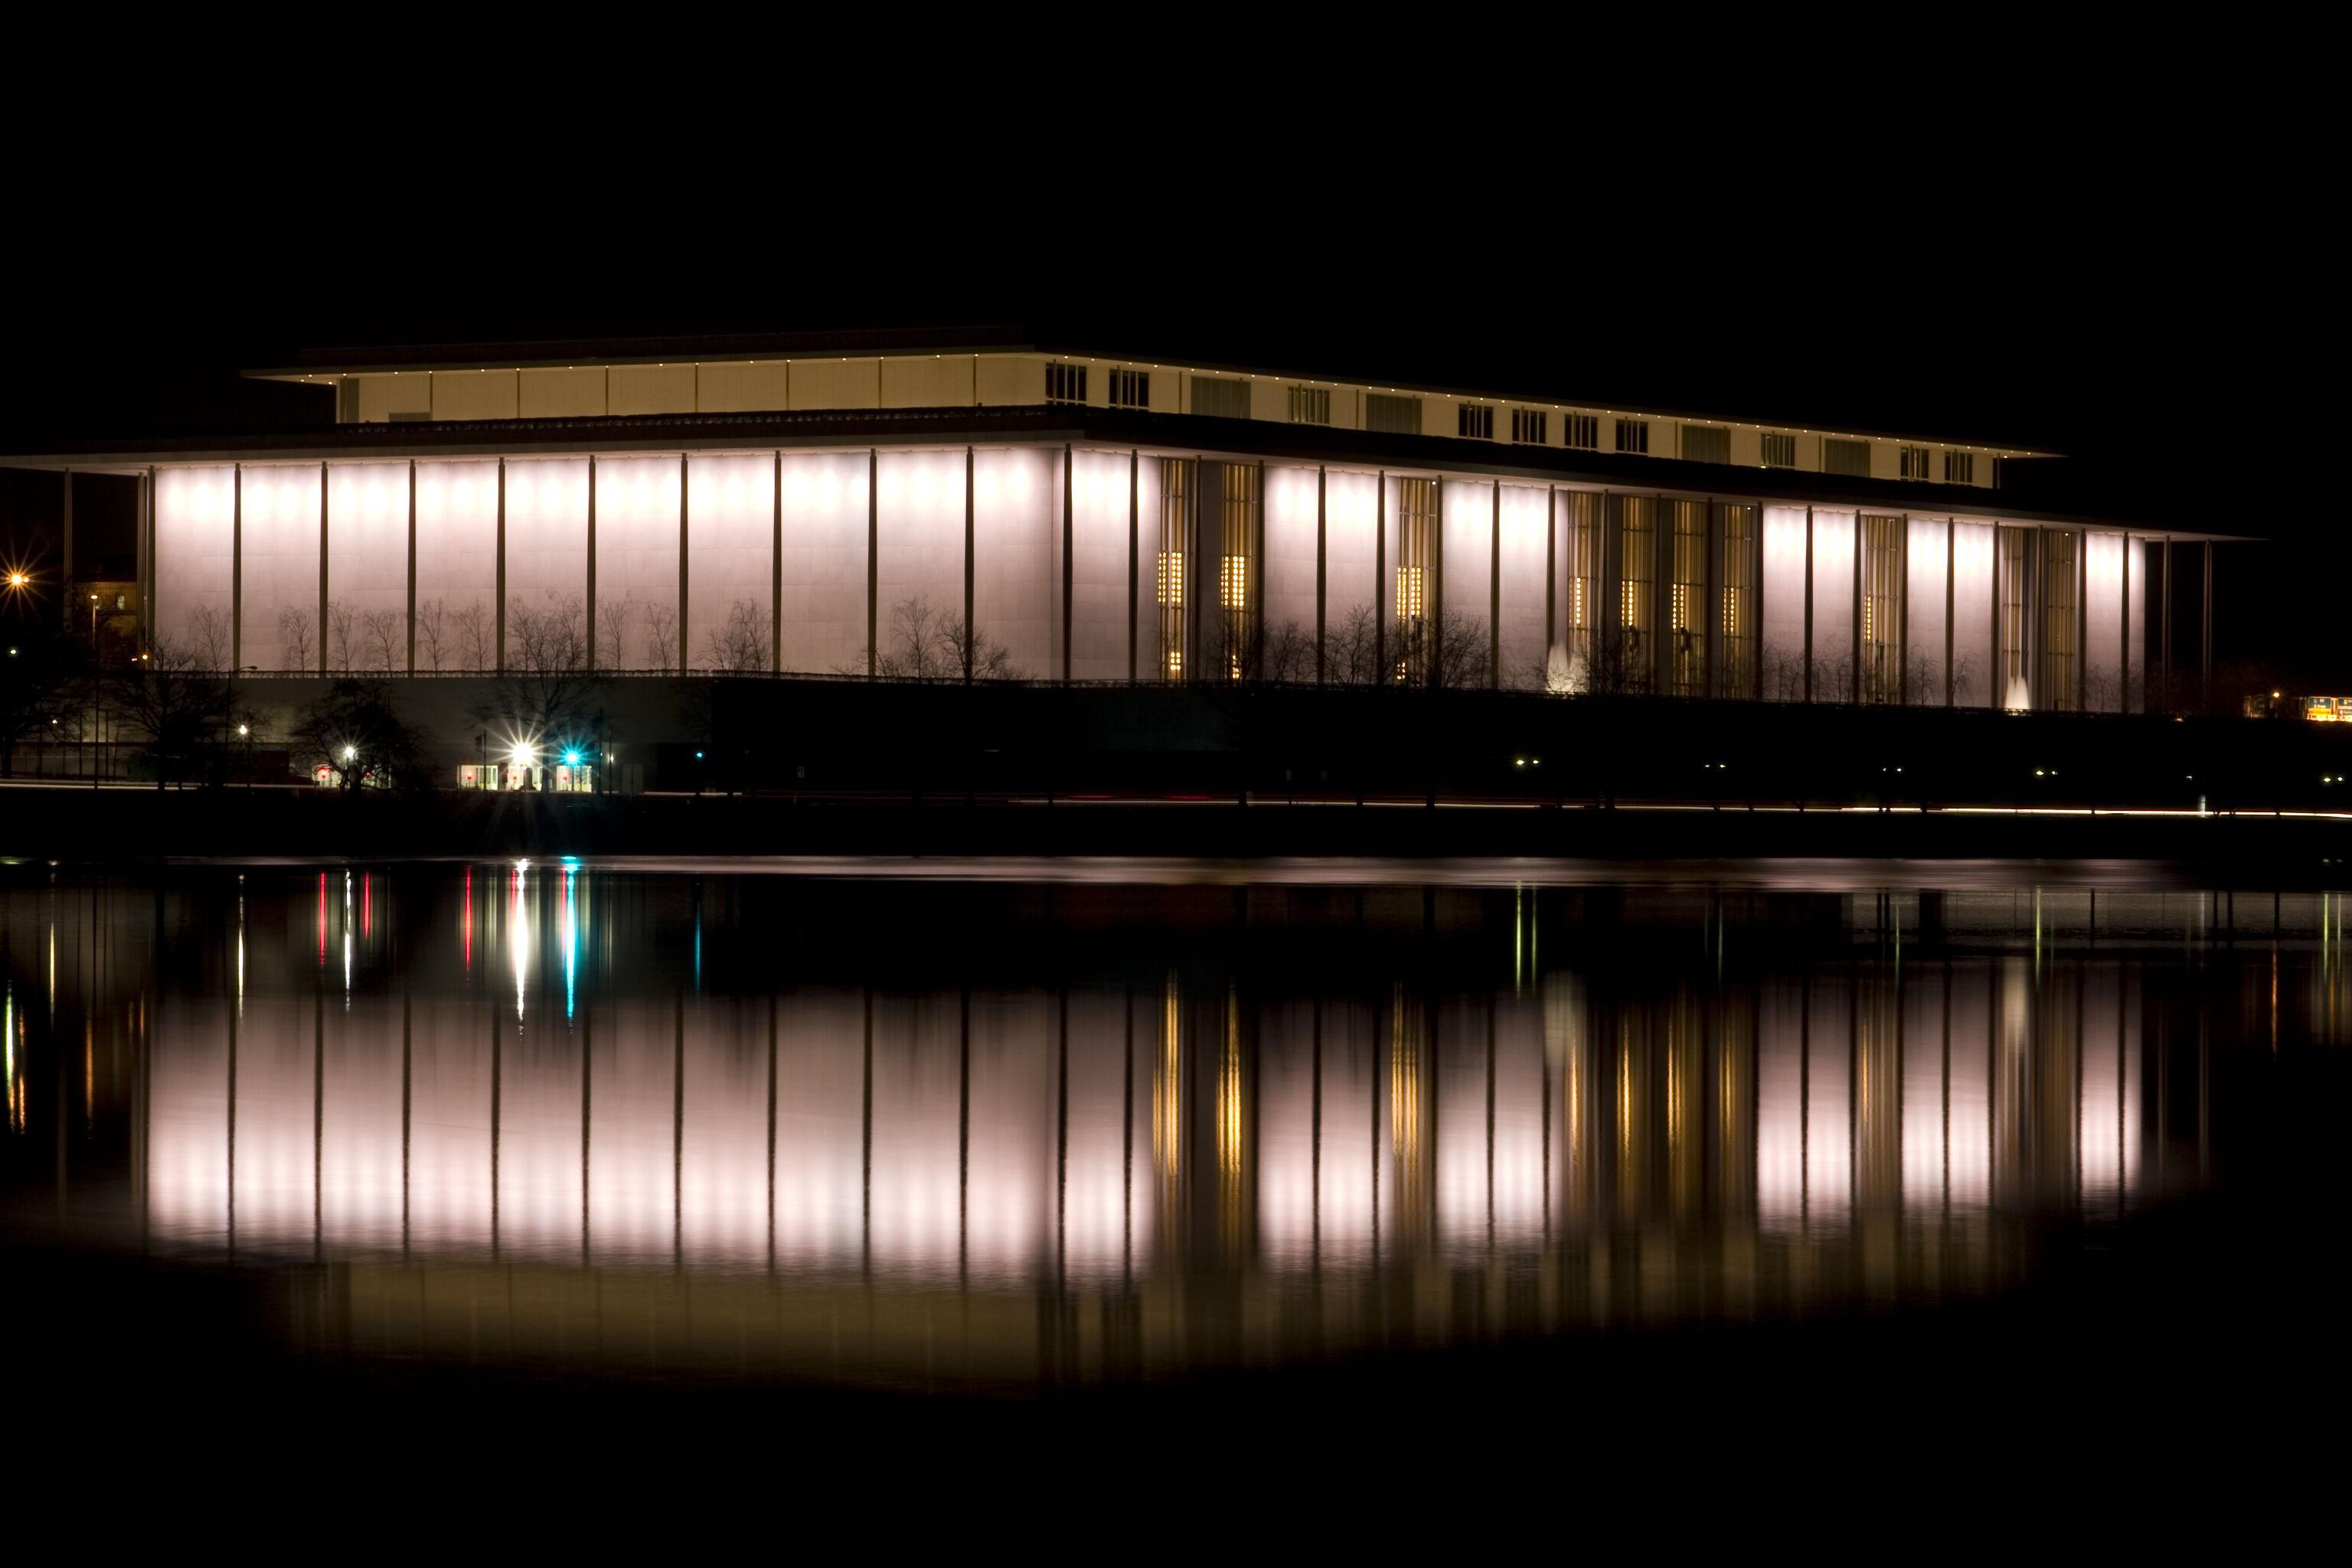 Kennedy Center cancels all performances through April 2021